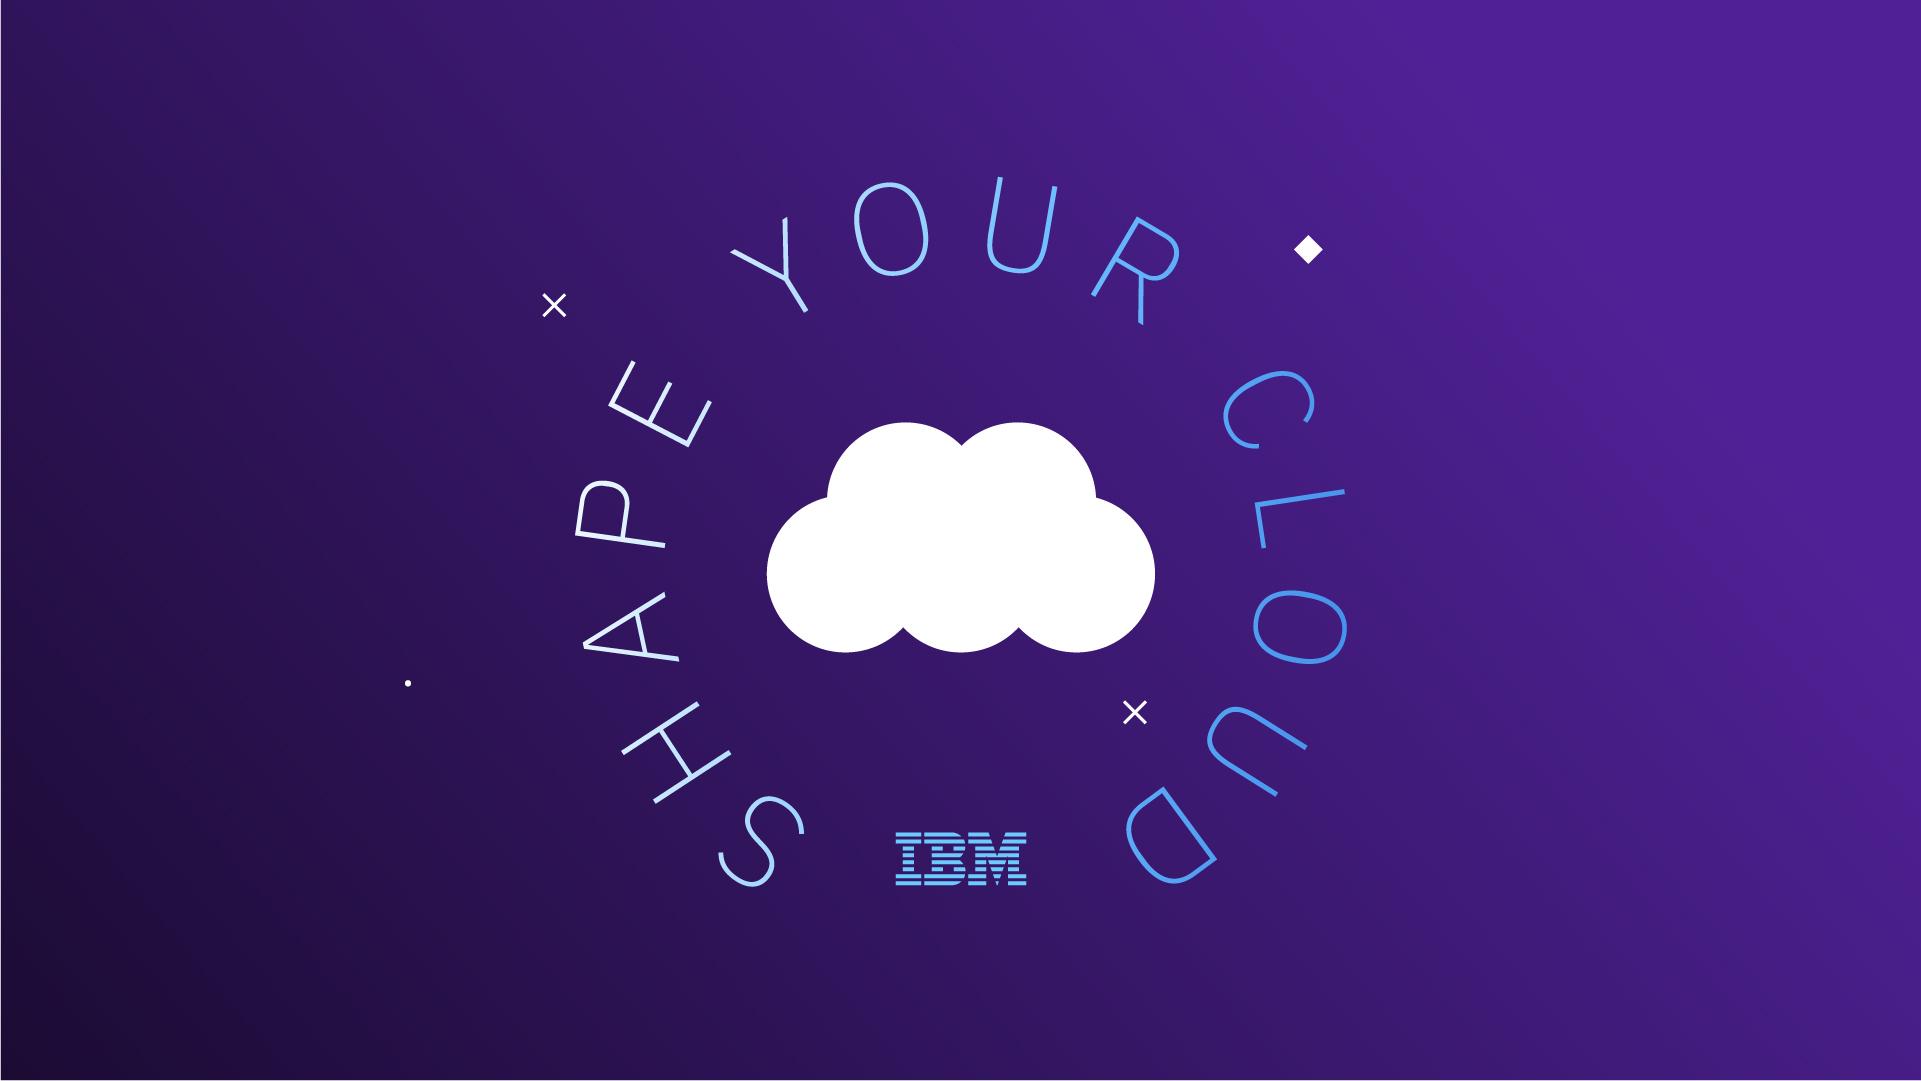 IBM_SHAPE-YOUR-CLOUD_DC_EDITS_BH_proceso_IBM-process-10.jpg